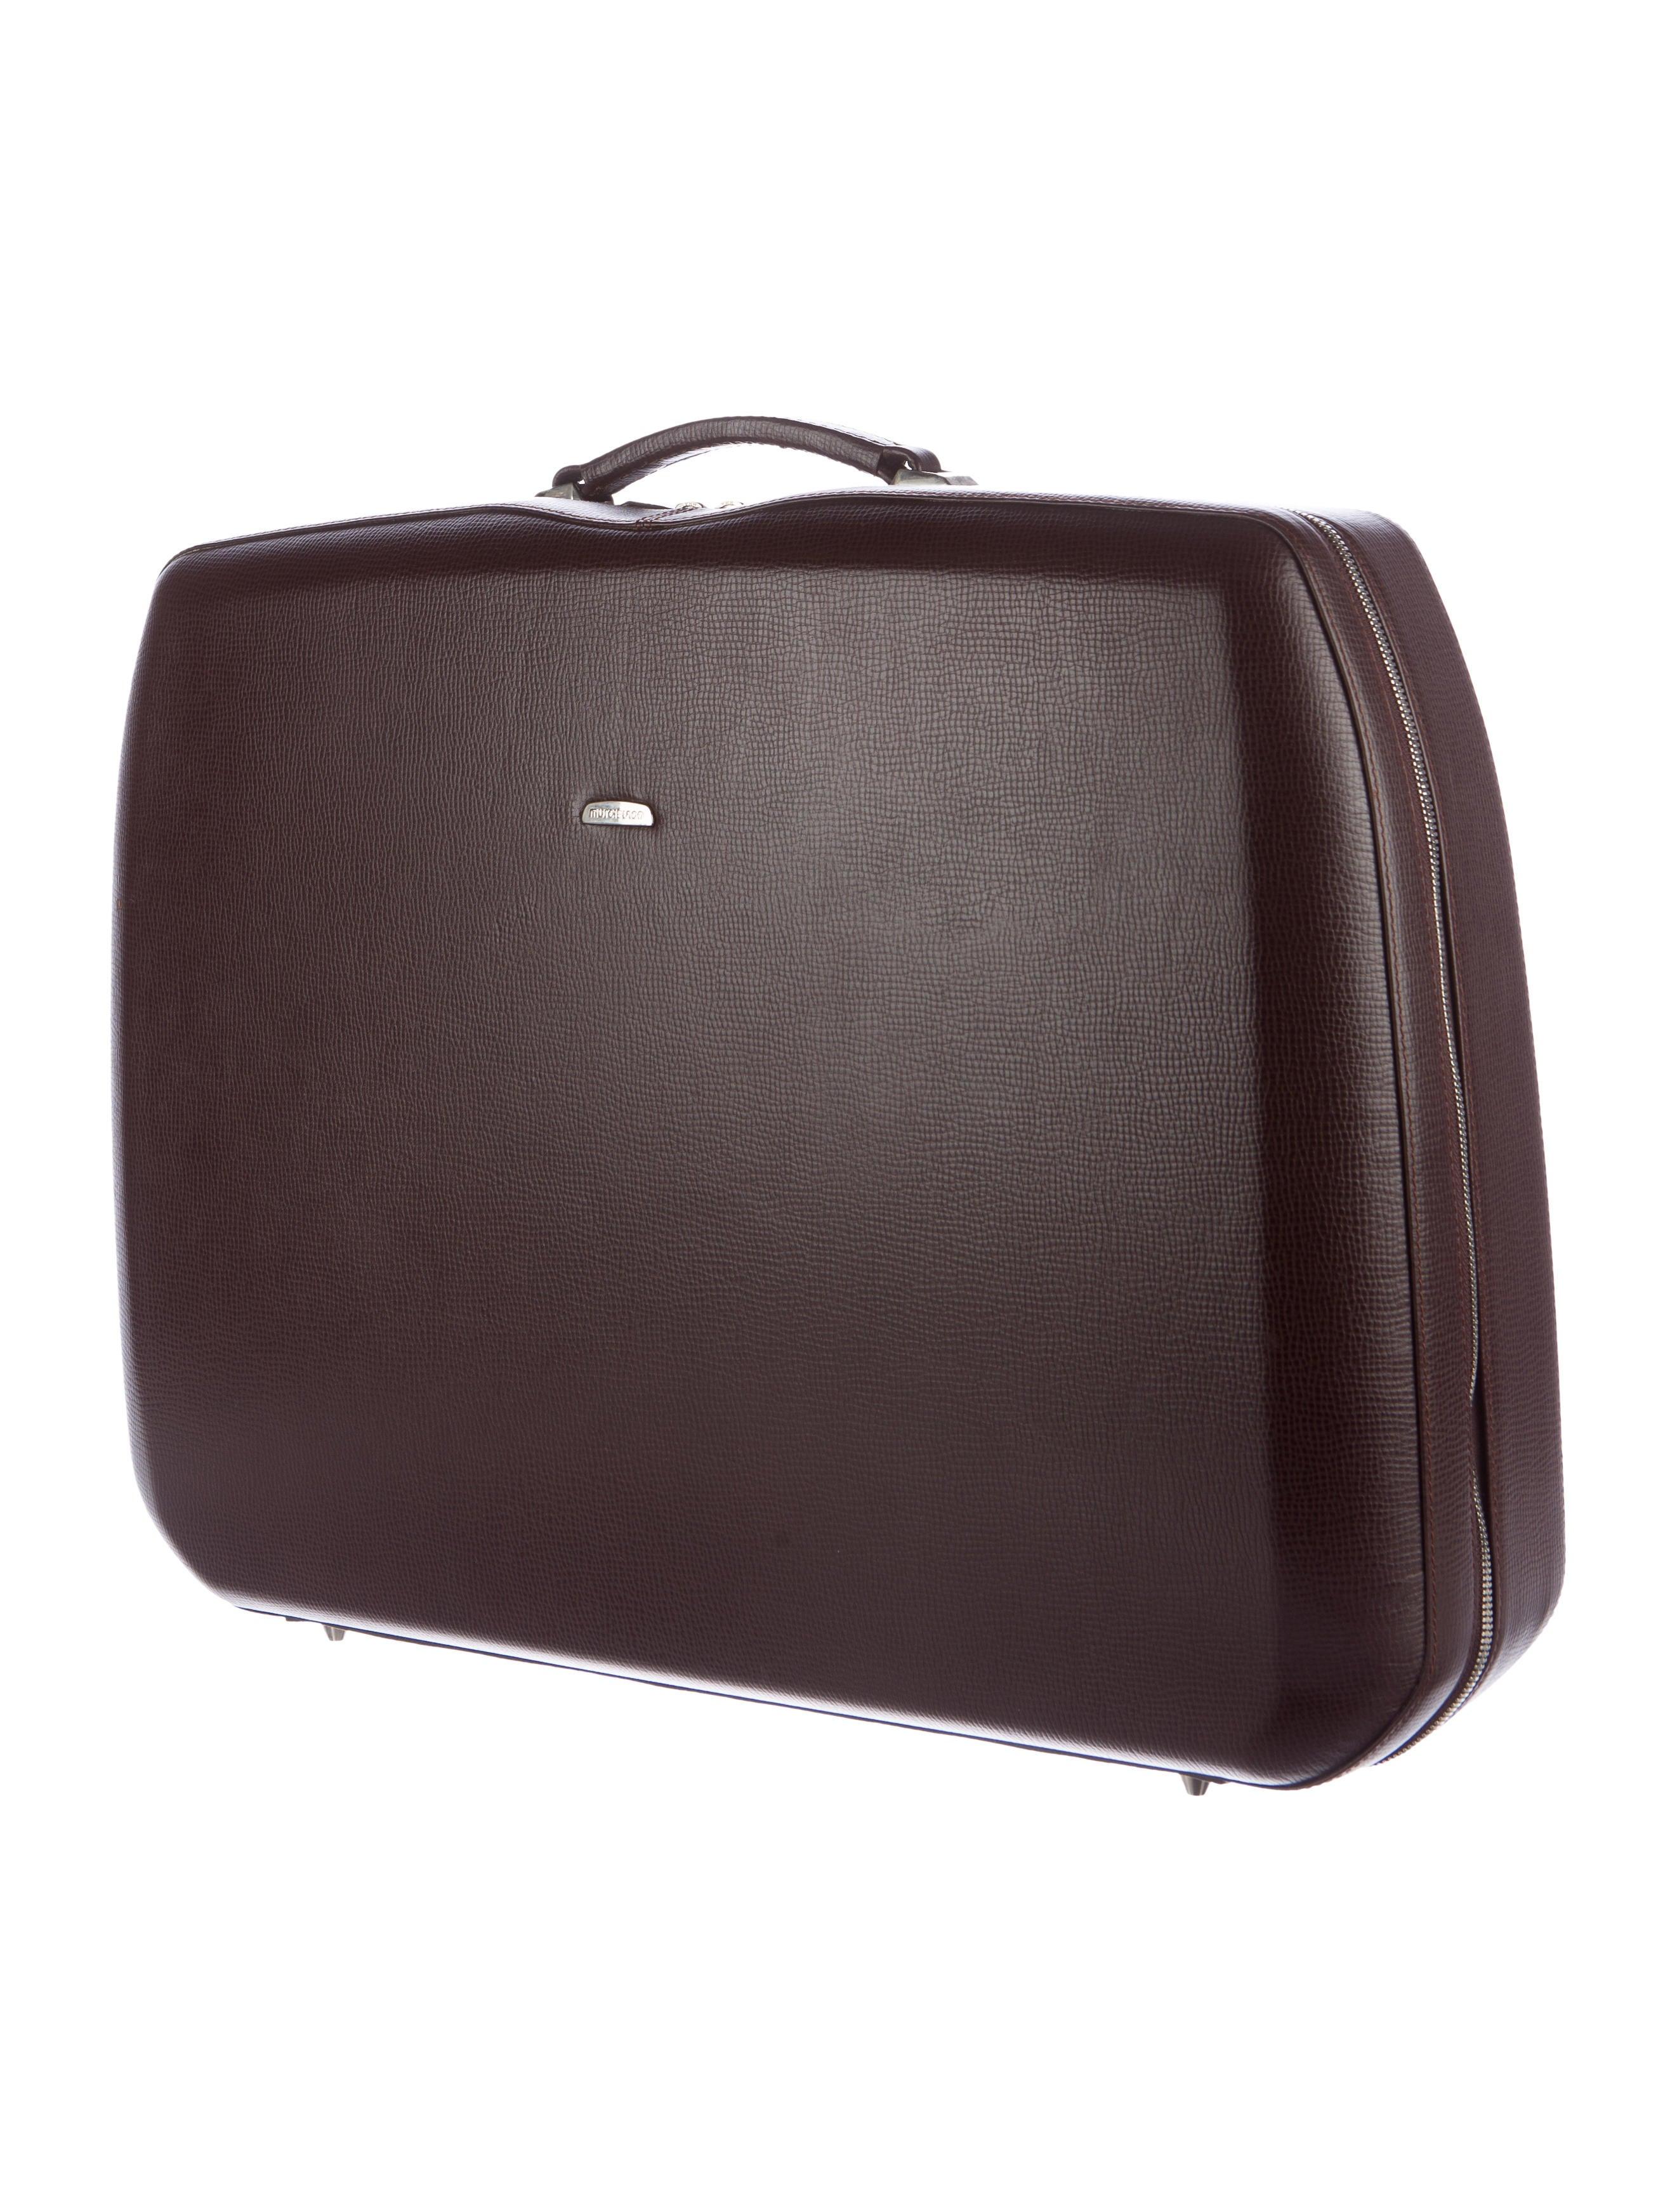 lamborghini leather hard shell suitcase luggage. Black Bedroom Furniture Sets. Home Design Ideas